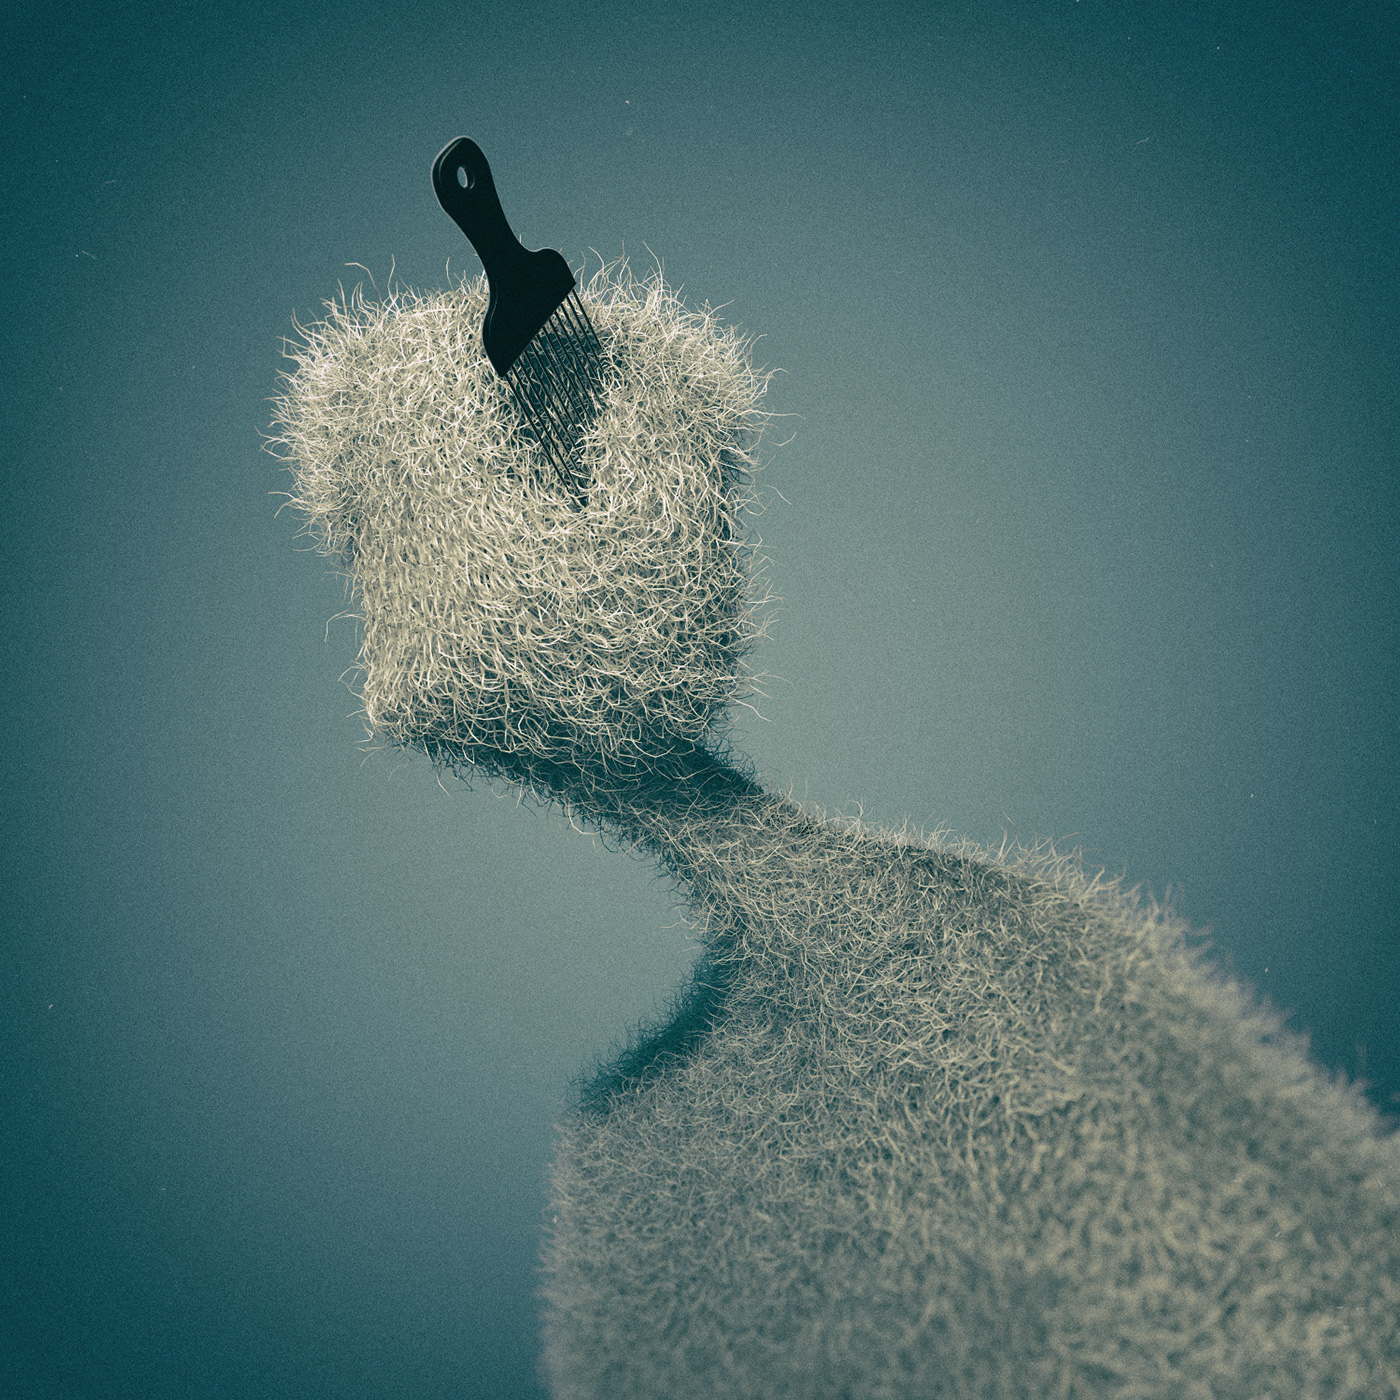 Family Fur / David McLaughlin